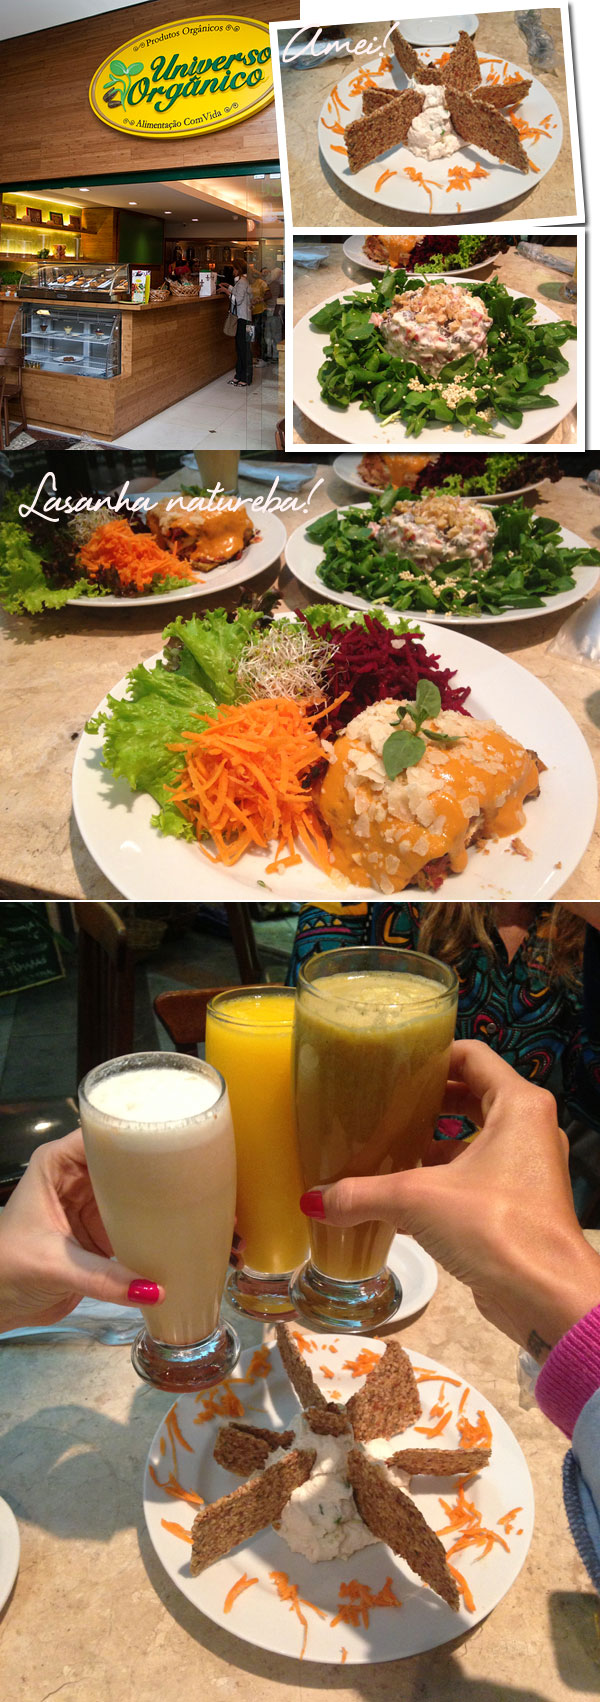 universo-organico-rio-de-janeiro-restaurante-natural-organico-leblon